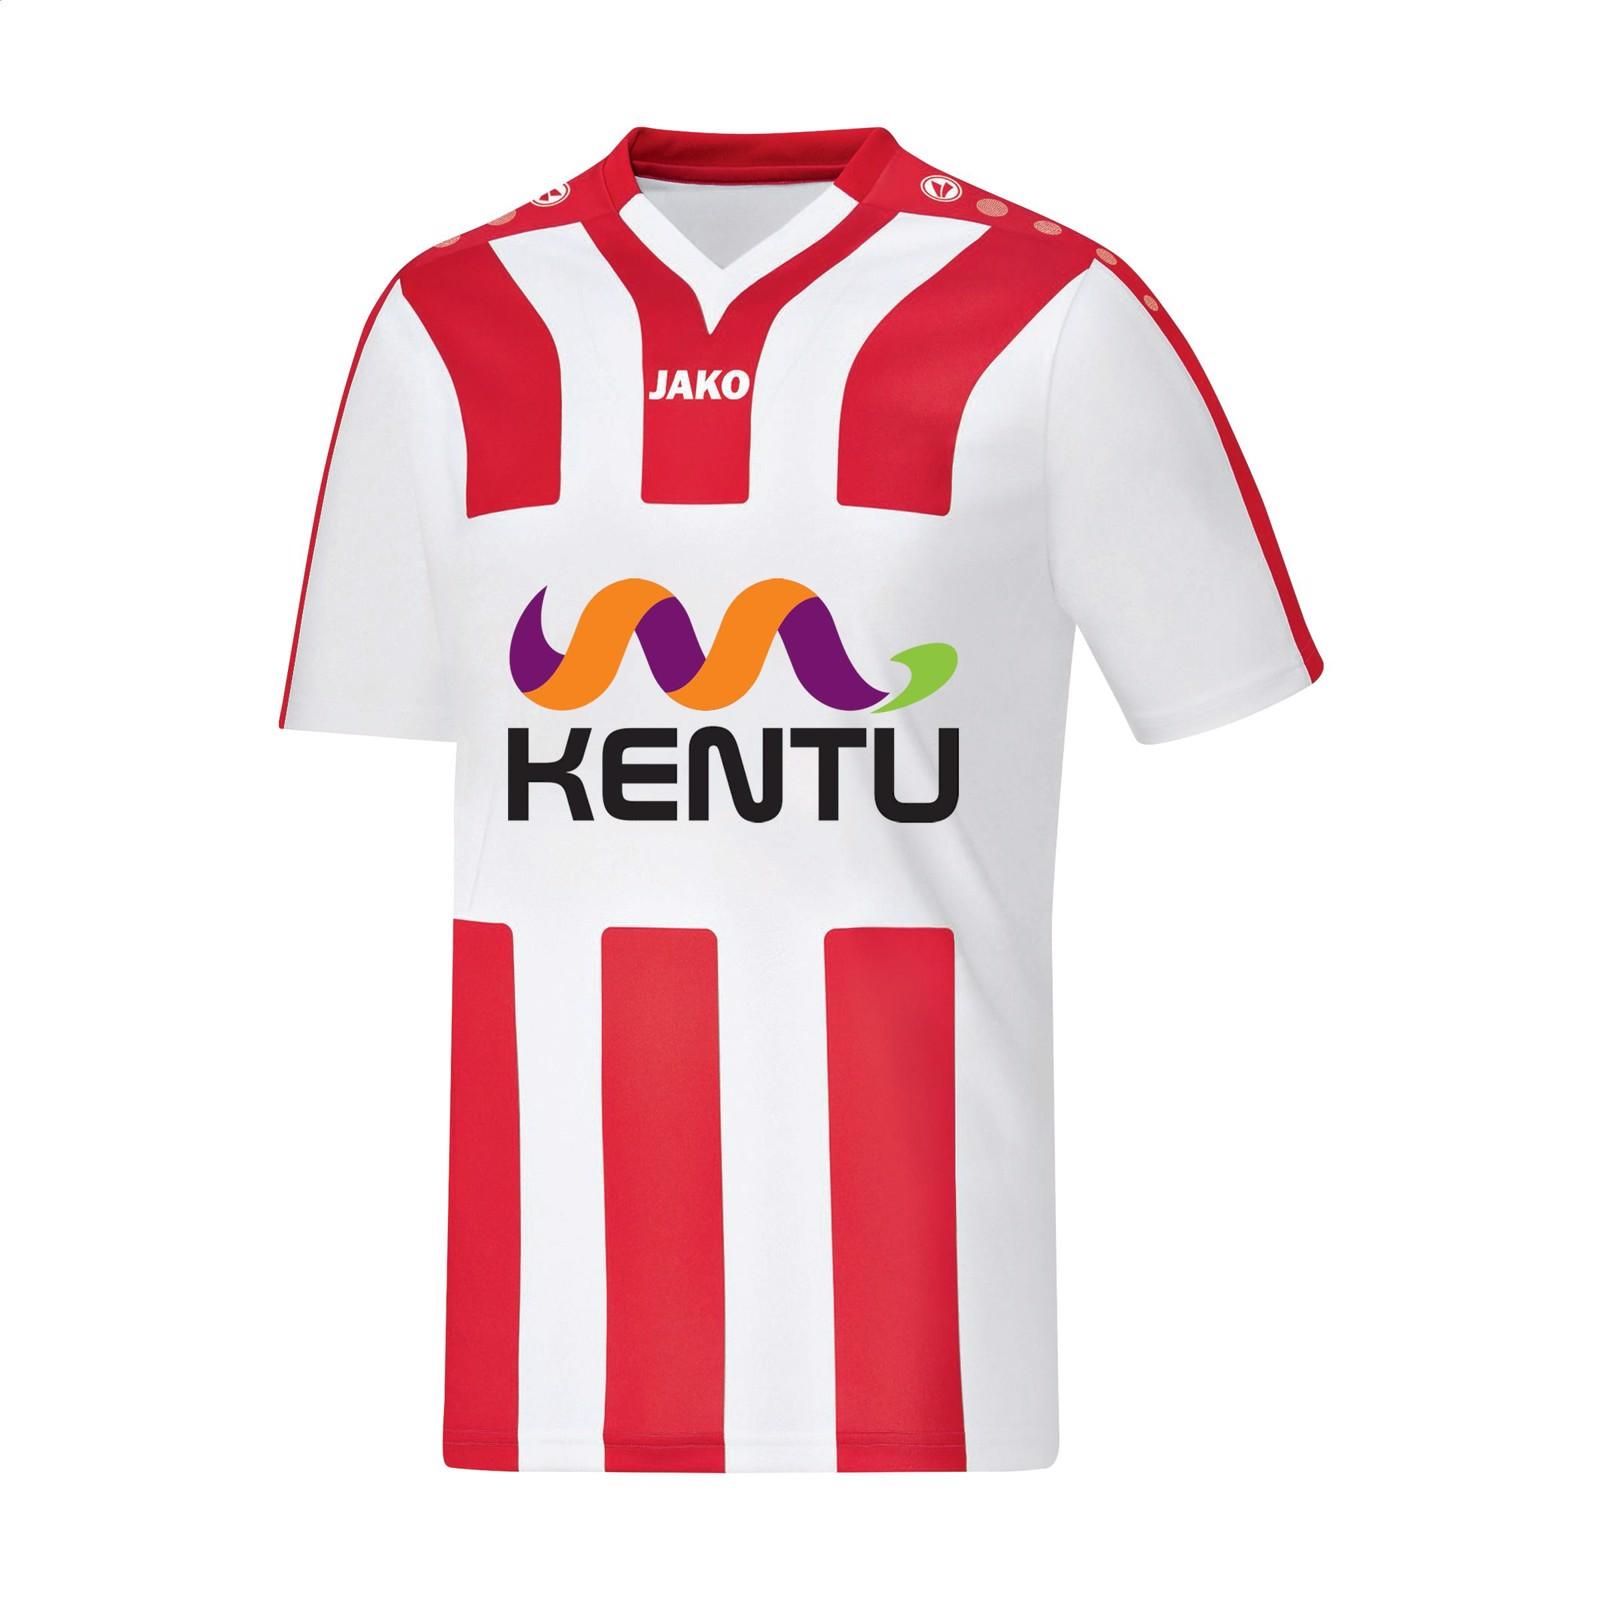 Jako® Shirt Santos KM mens sportshirt - White / Red / M